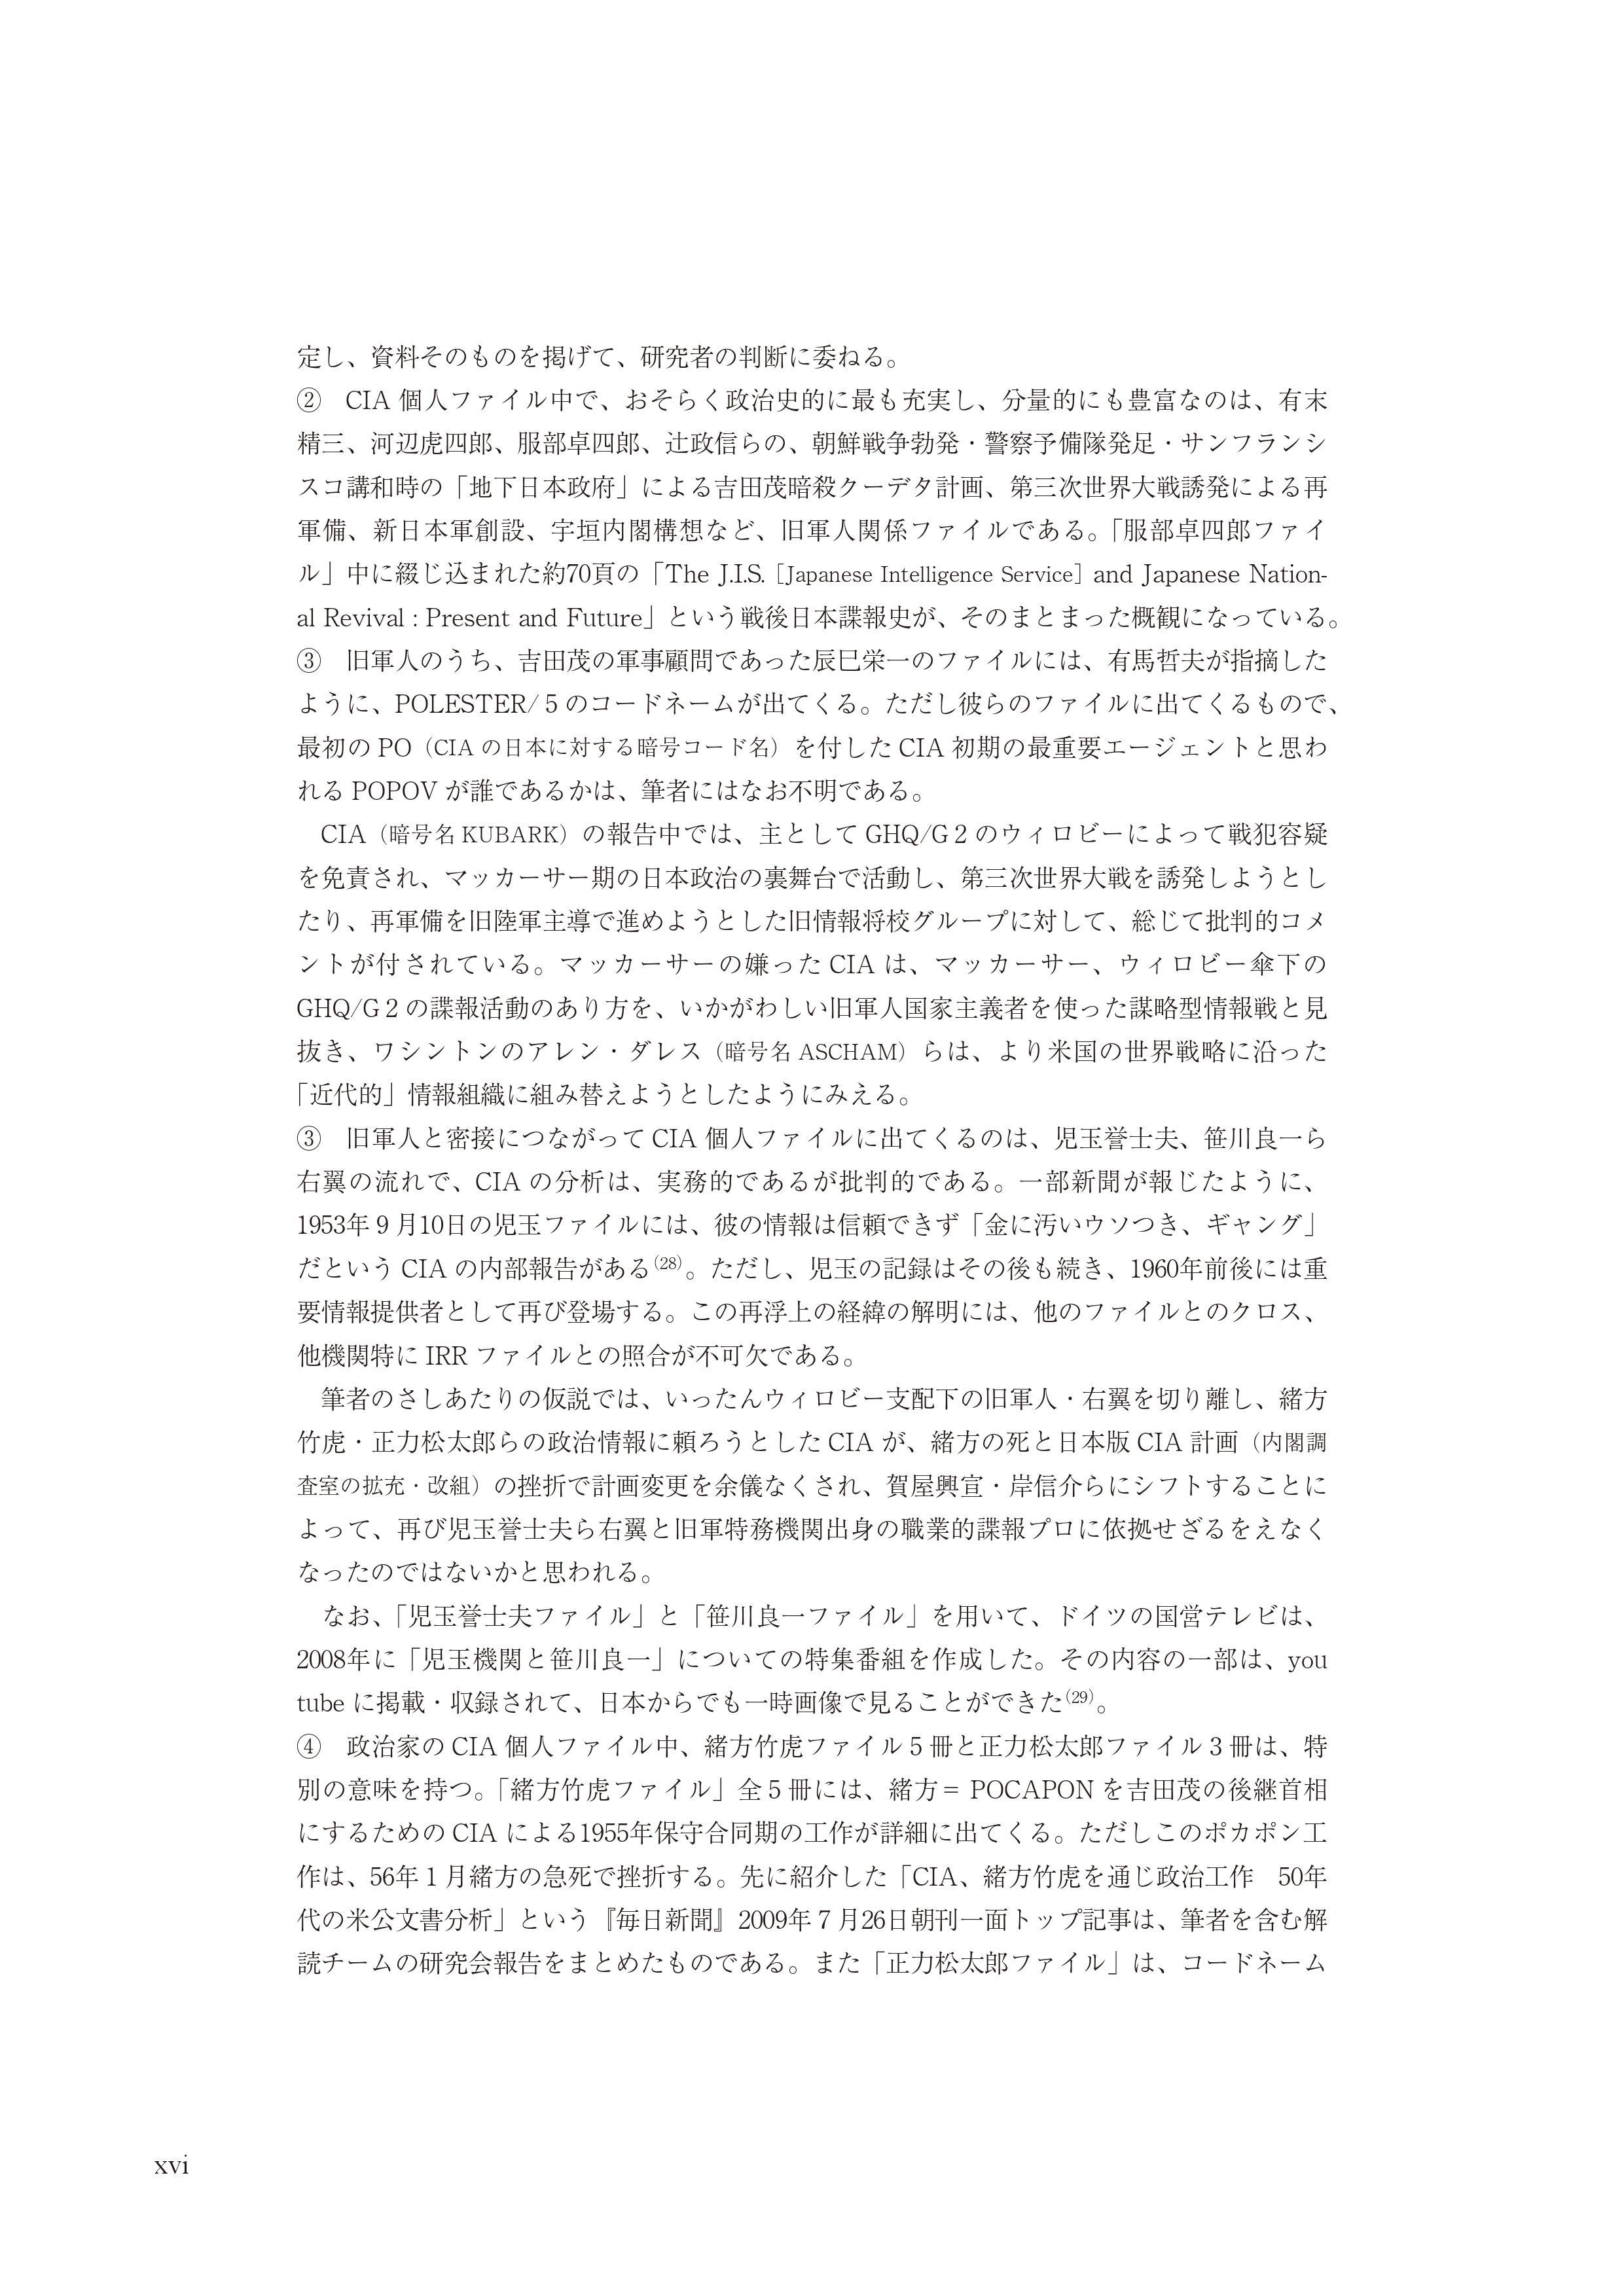 CIA日本人ファイル0001 (16)